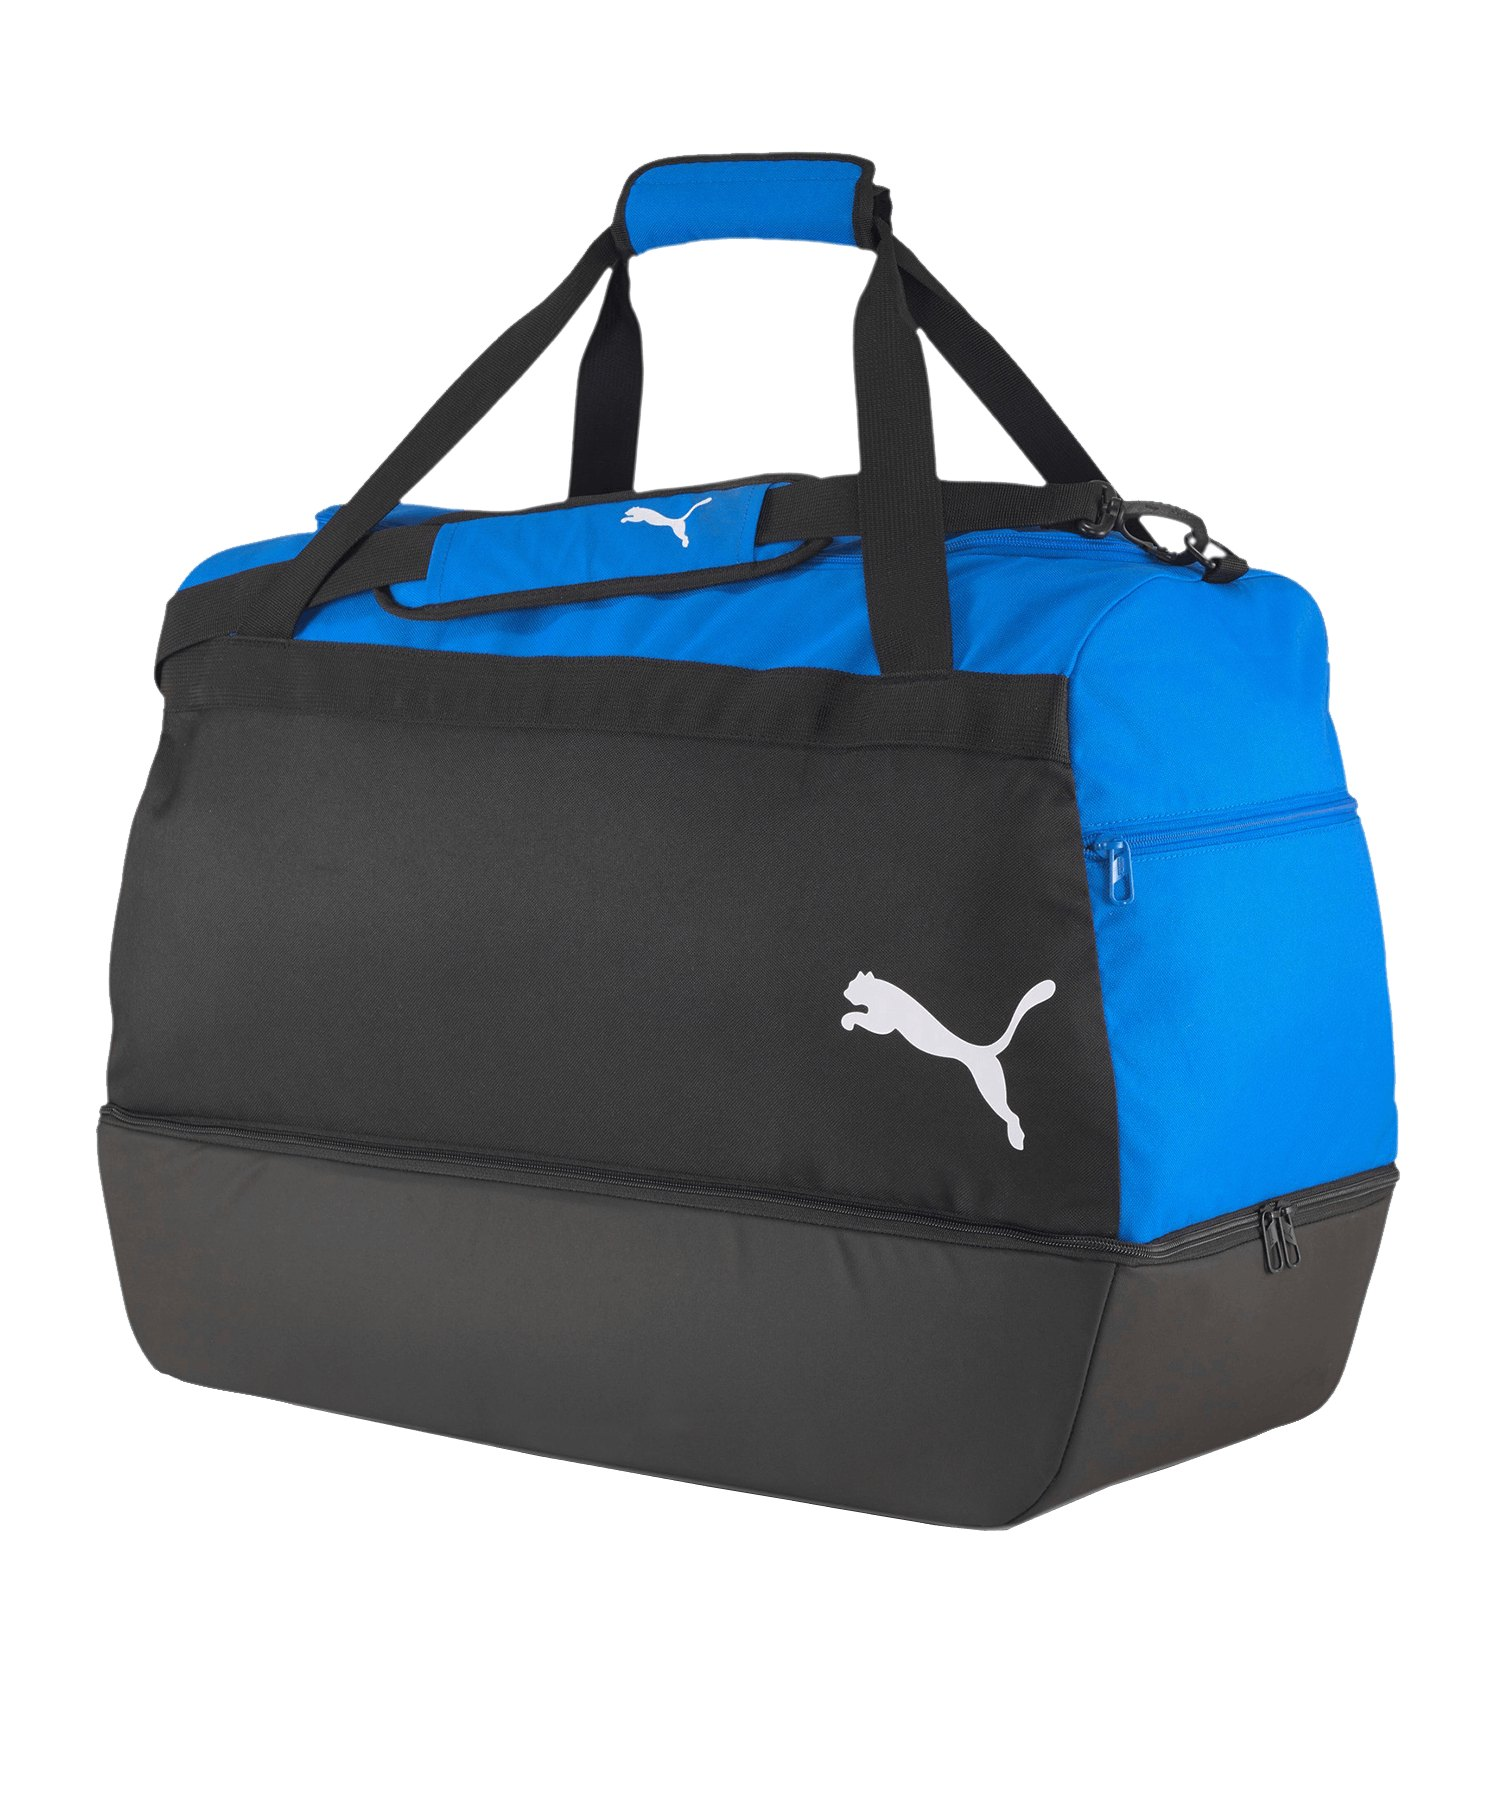 PUMA teamGOAL 23 Teambag Sporttasche BC Gr. M F02 - blau